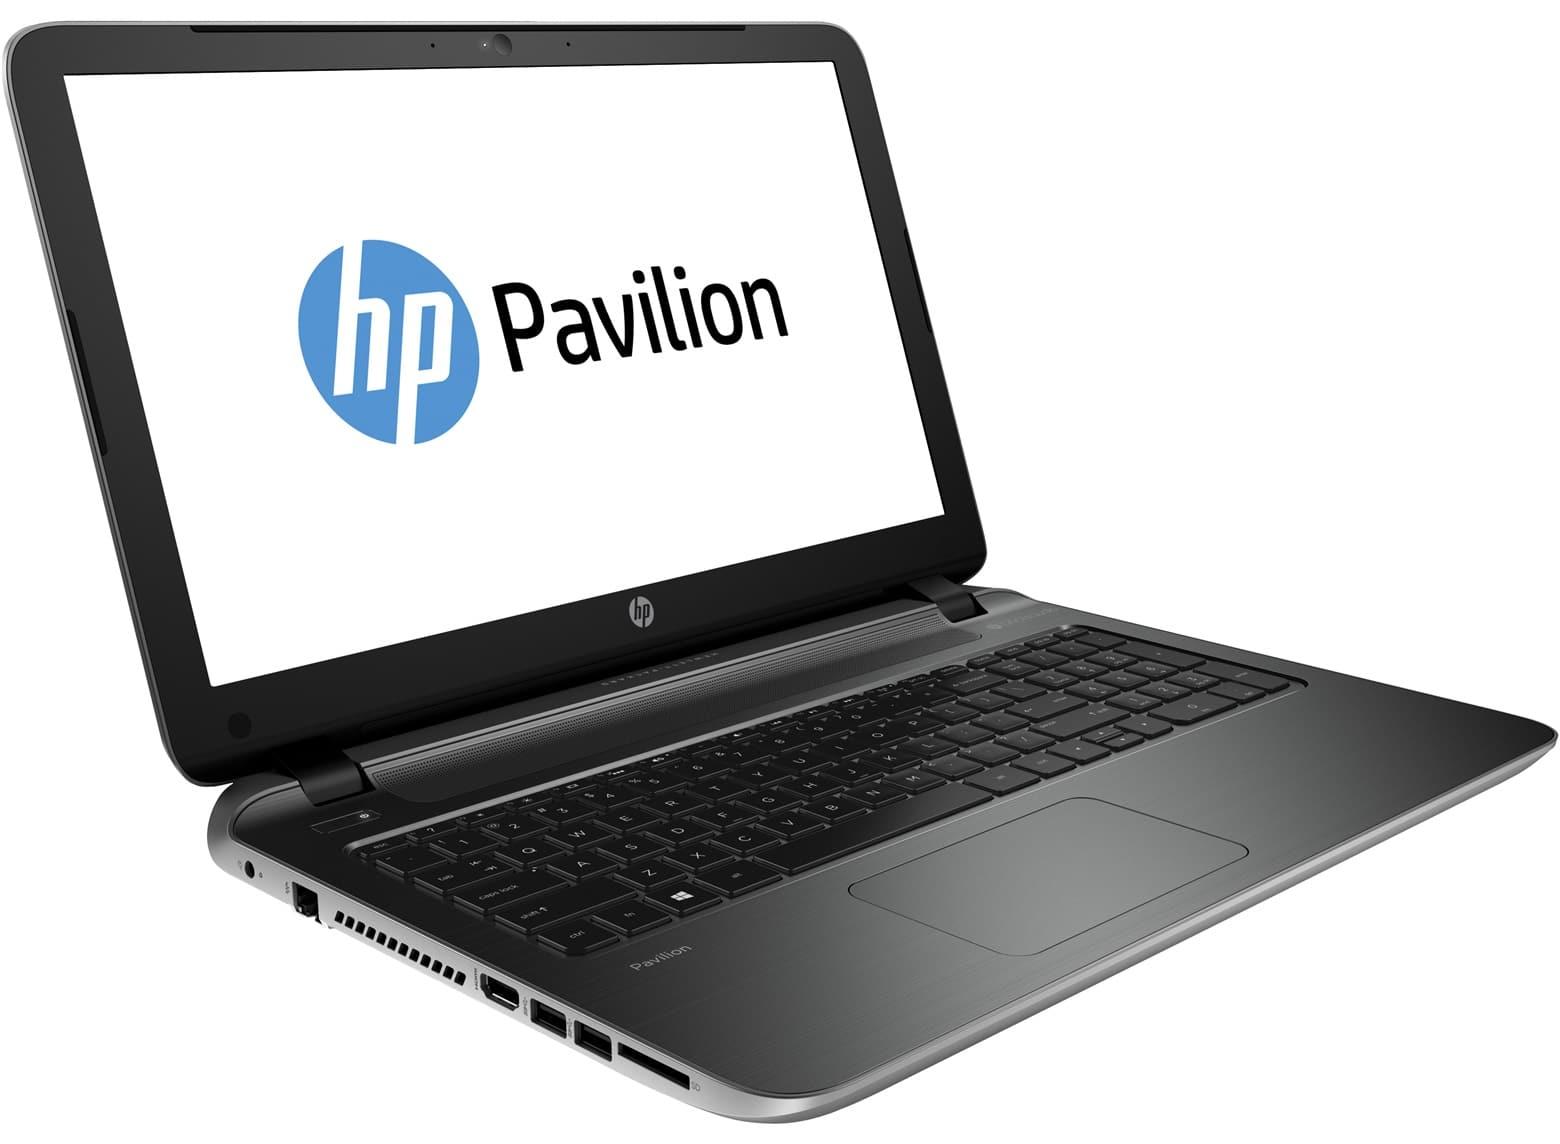 HP Pavilion 15-p207nf 3